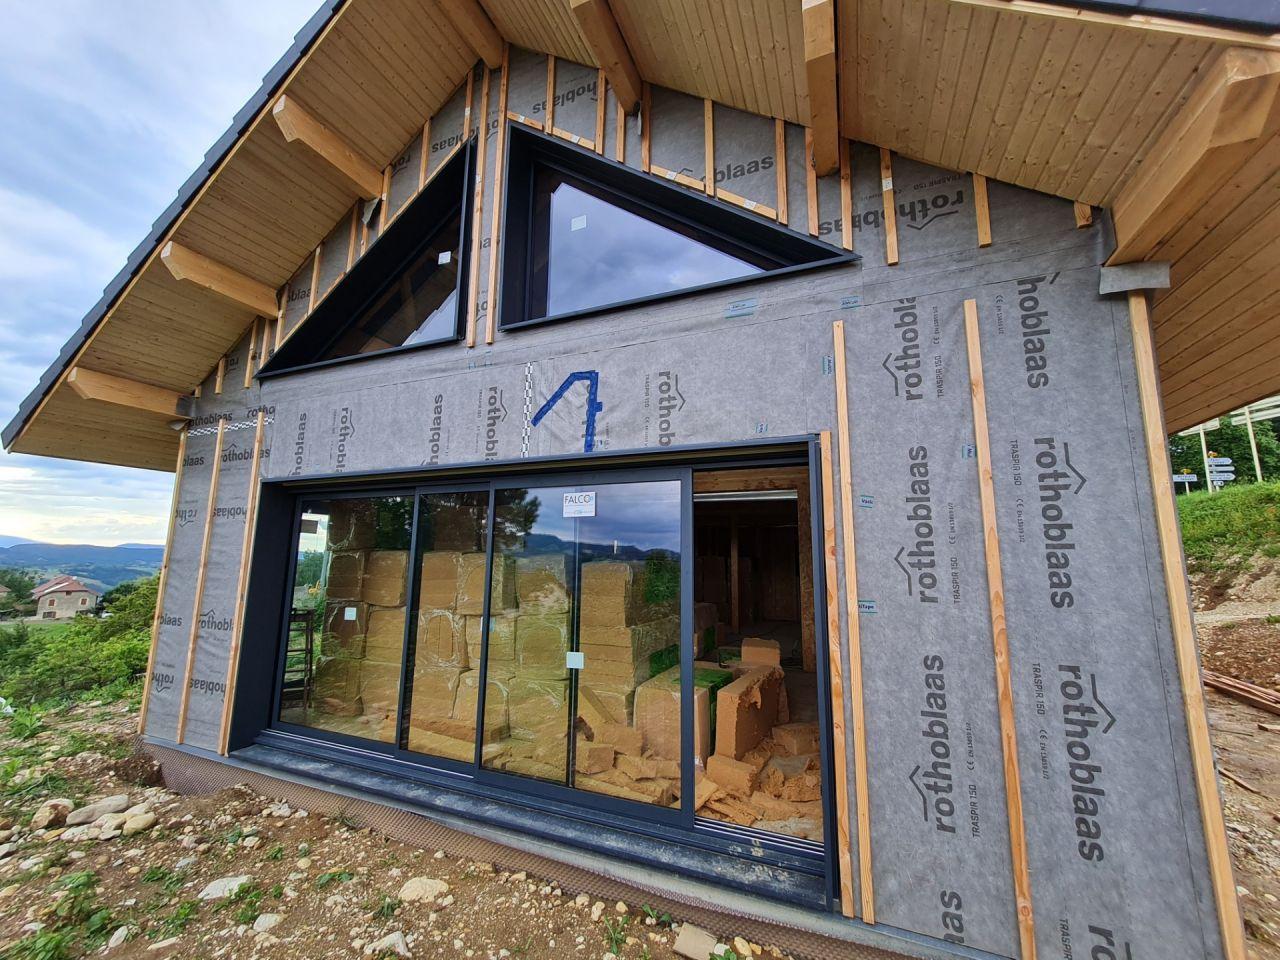 Fenêtres triangles + baie vitrée 4.5mètres